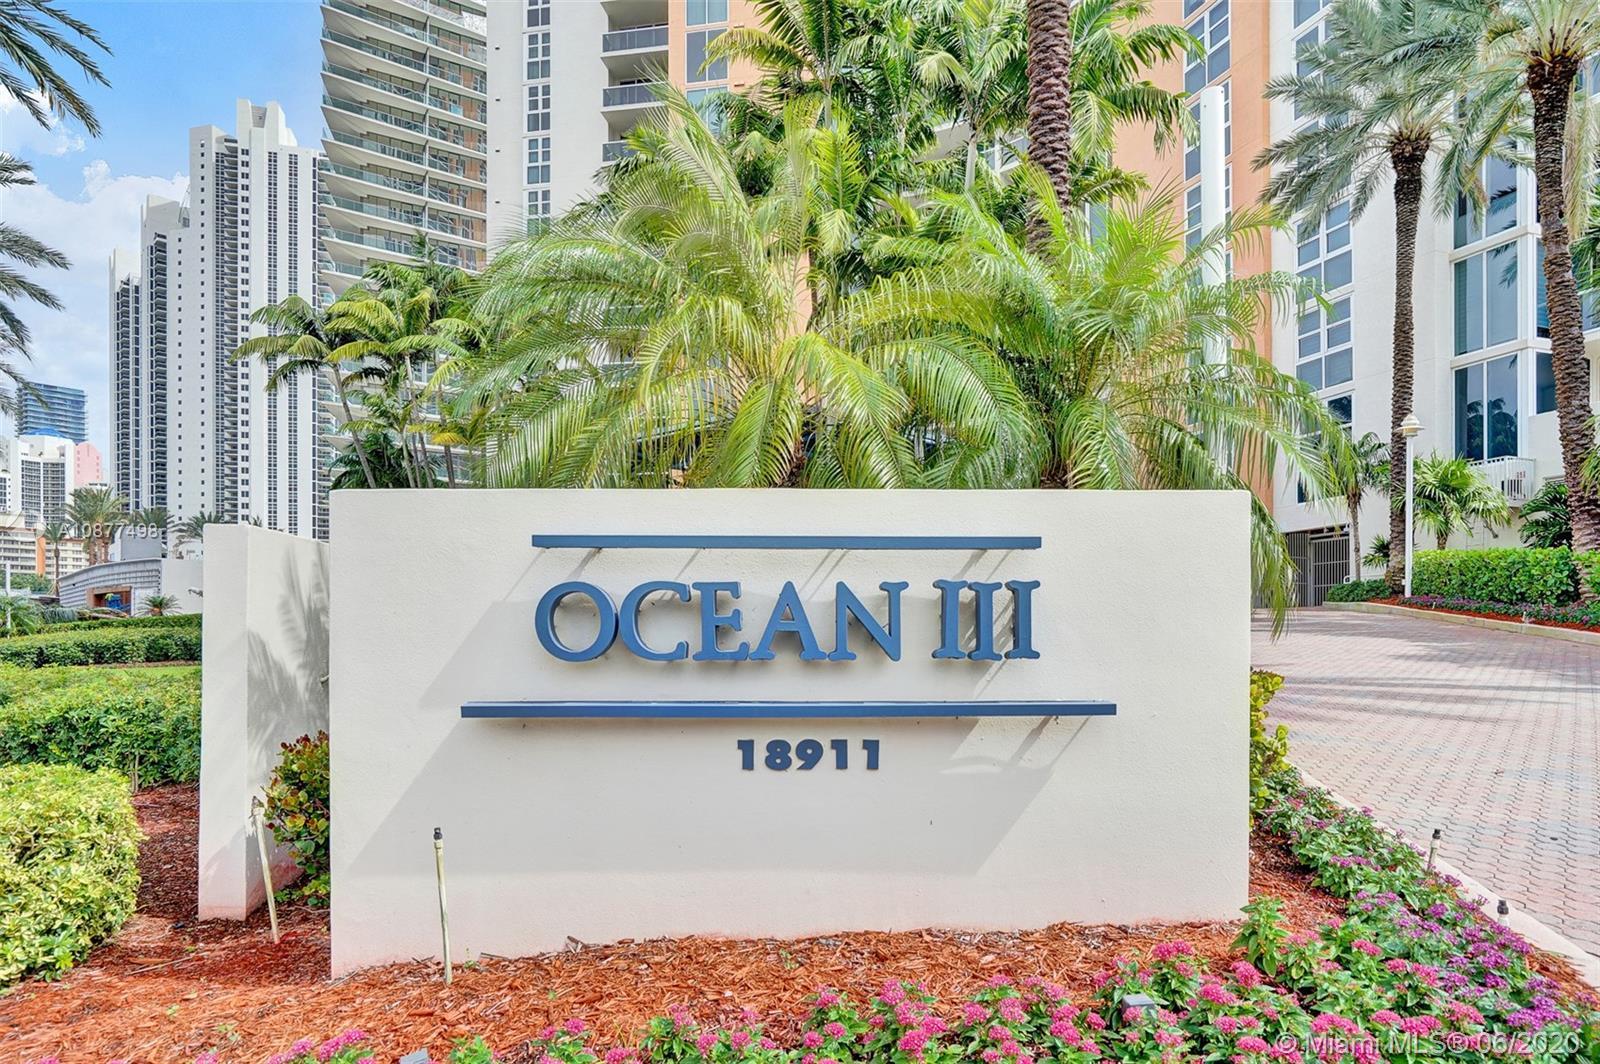 Ocean three #2102 - 03 - photo